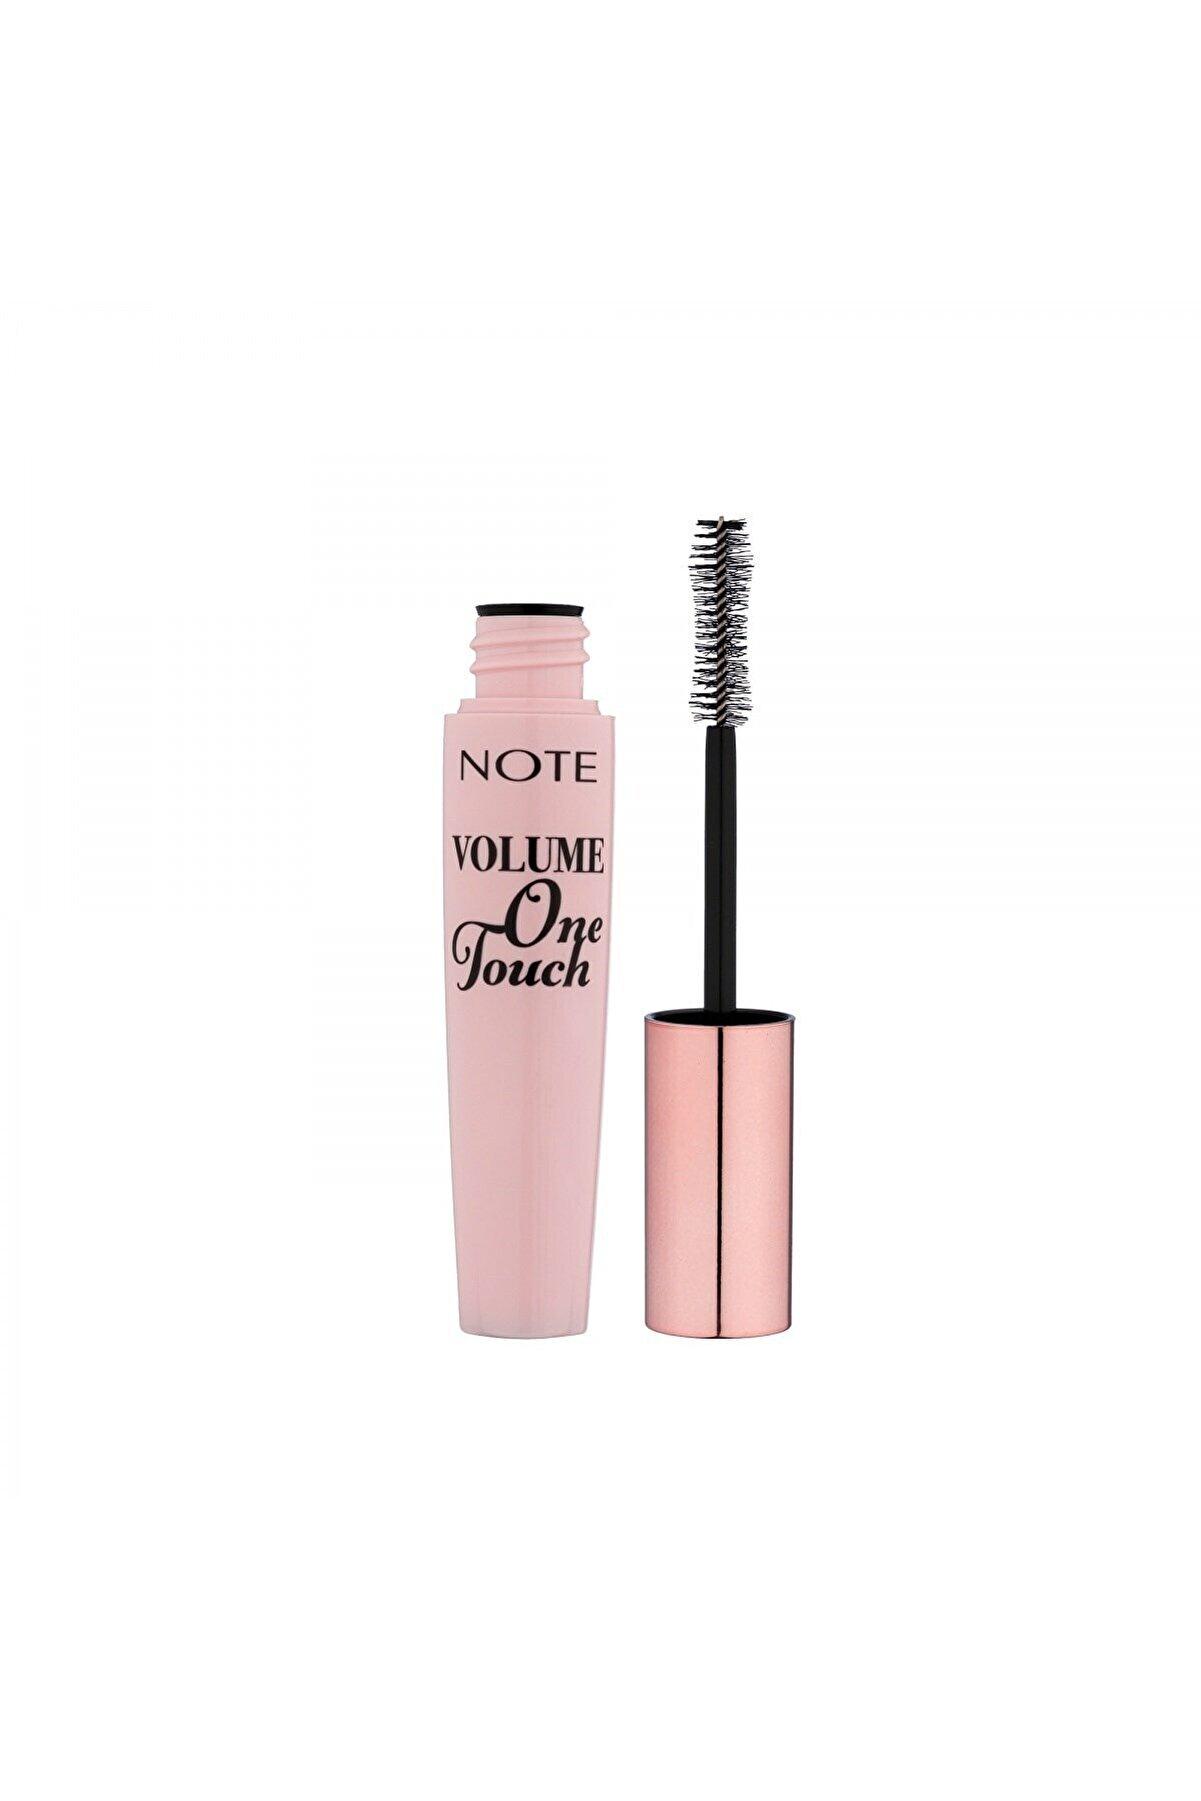 Note Cosmetics Volume One Touch Maskara Tek Tek Ayırma Ve Hacim